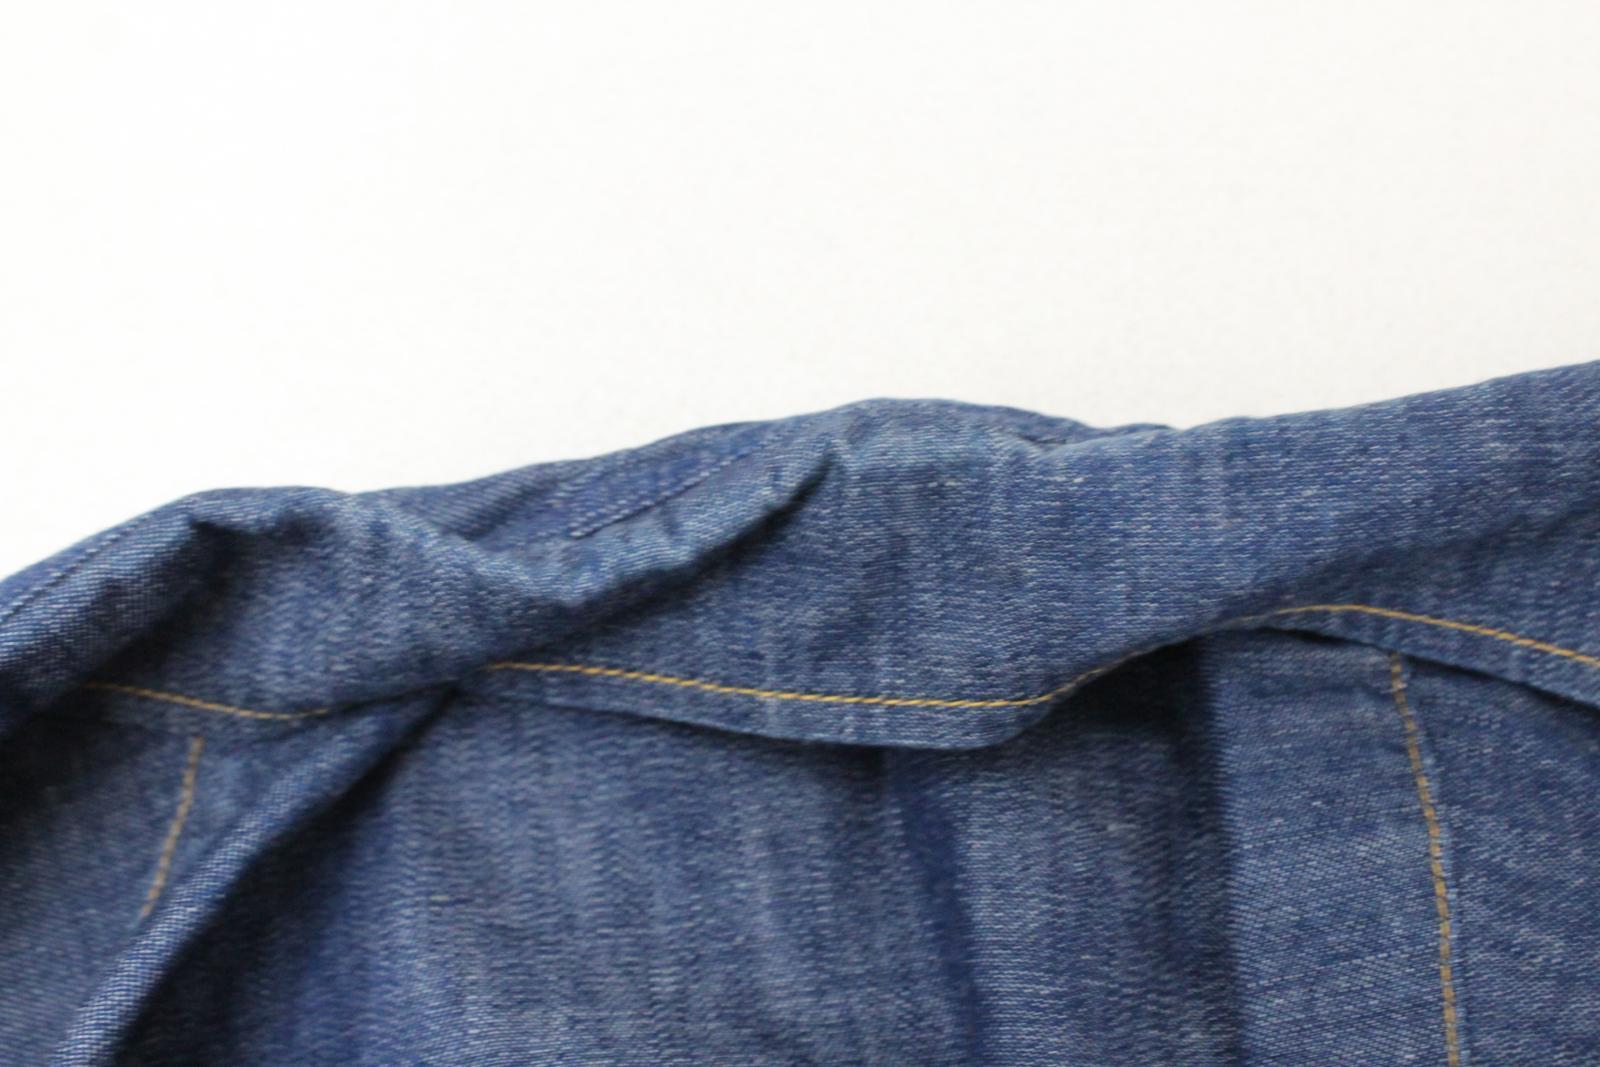 Lee-Jeans-de-hombre-Vintage-Denim-Azul-Algodon-con-Corchetes-Cierre-Mangas-Largas-Camisa-S miniatura 10